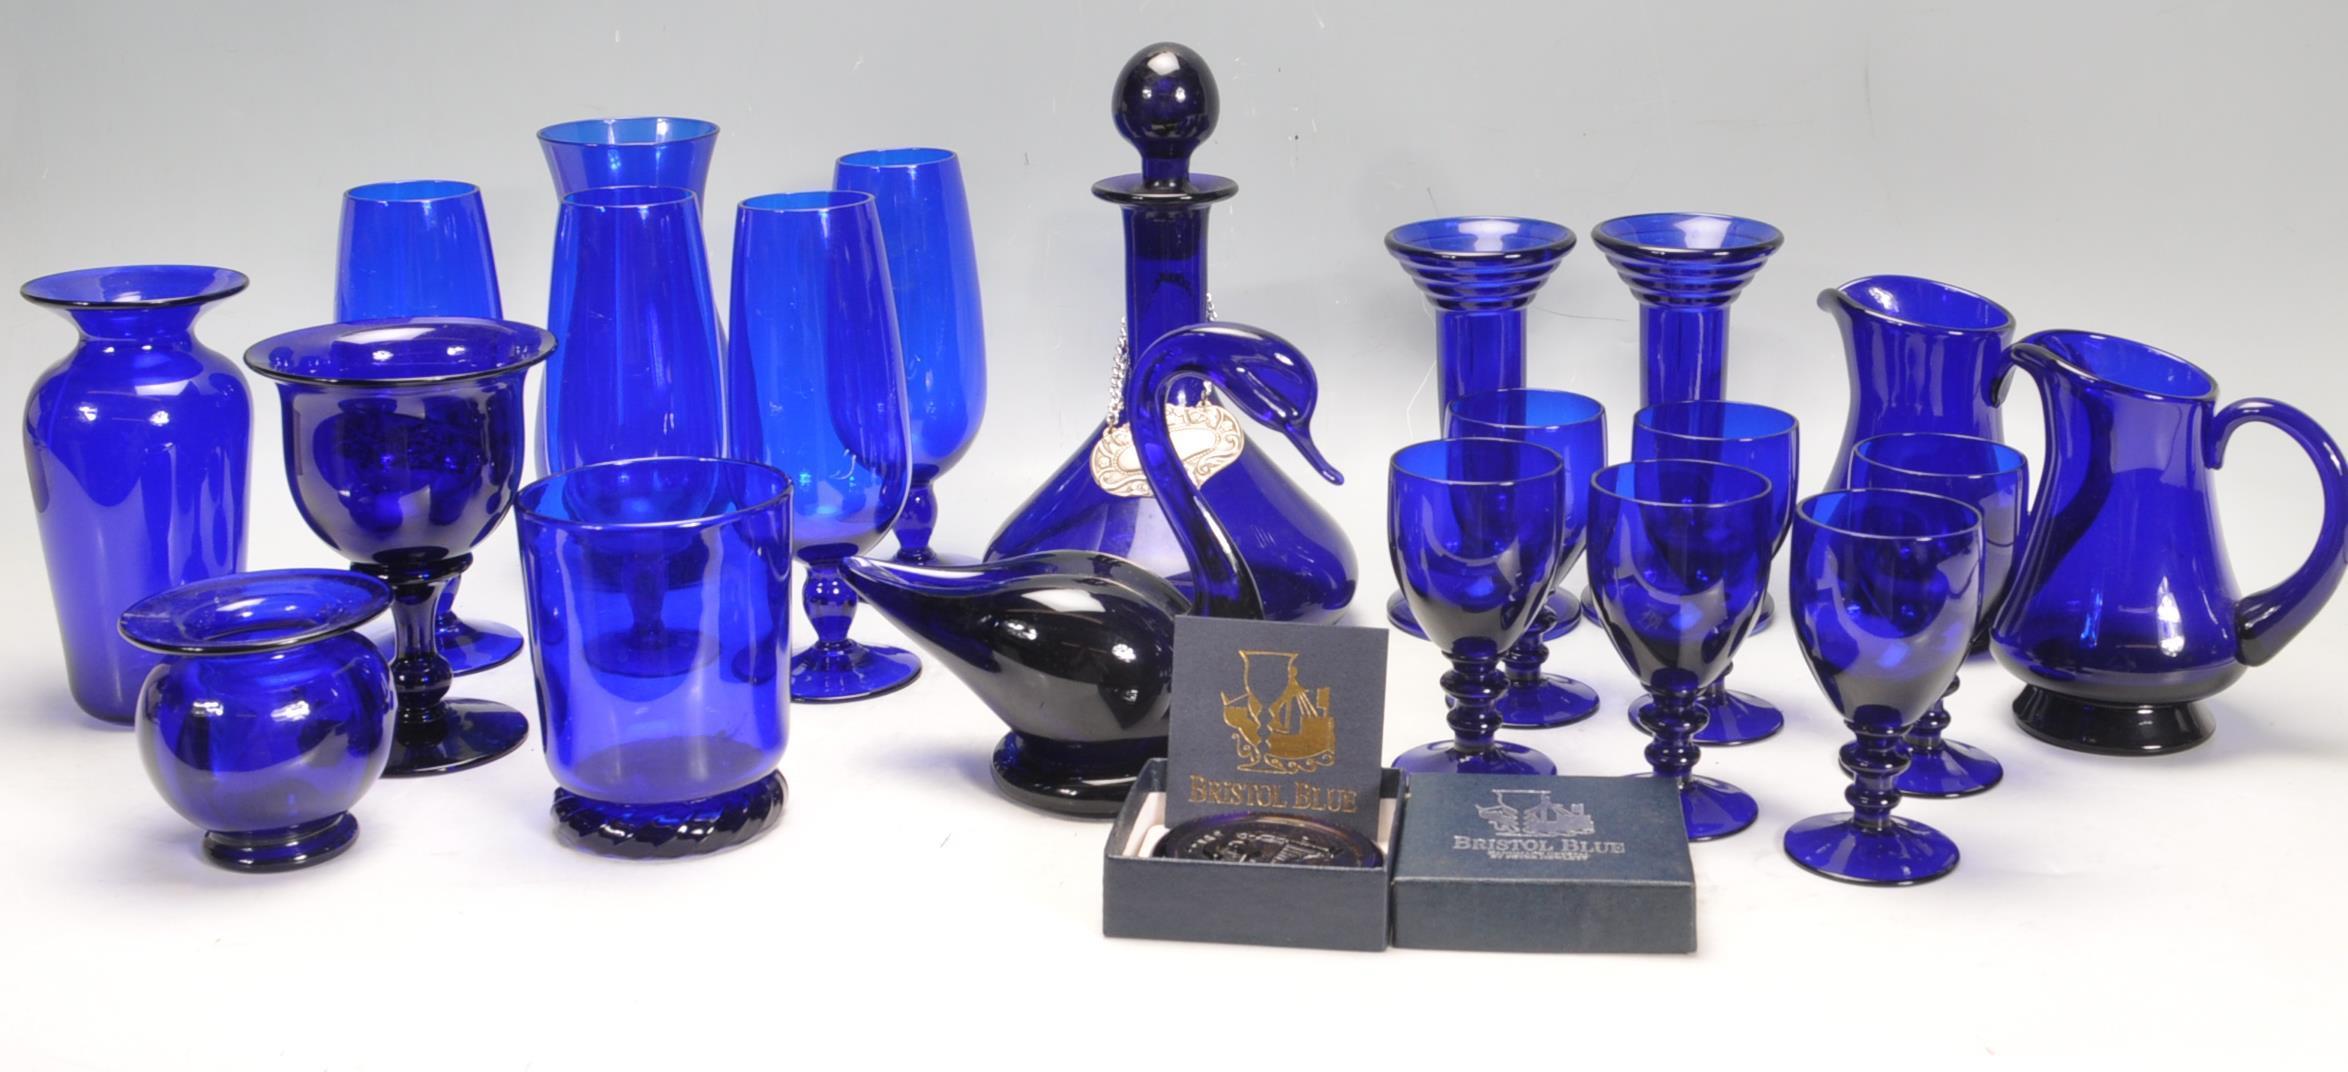 BRISTOL BLUE GLASS ORNAMENTS